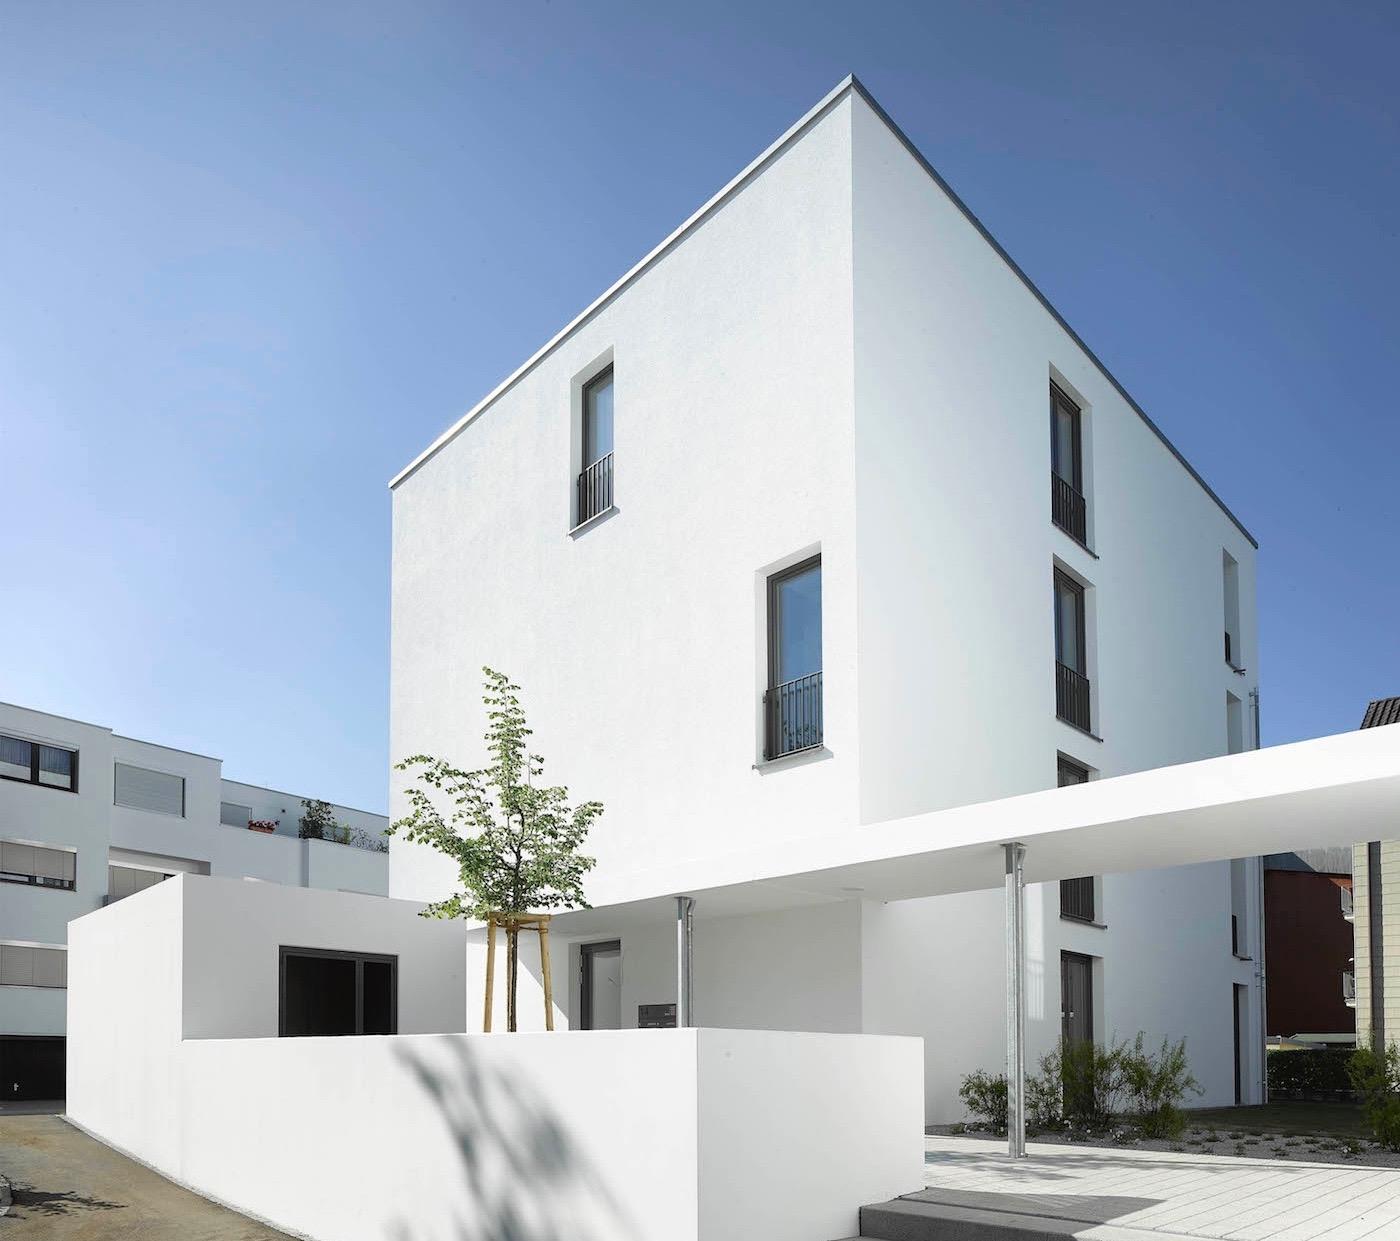 Wohnbebauung »Am Lerchenbuckel« Reutlingen